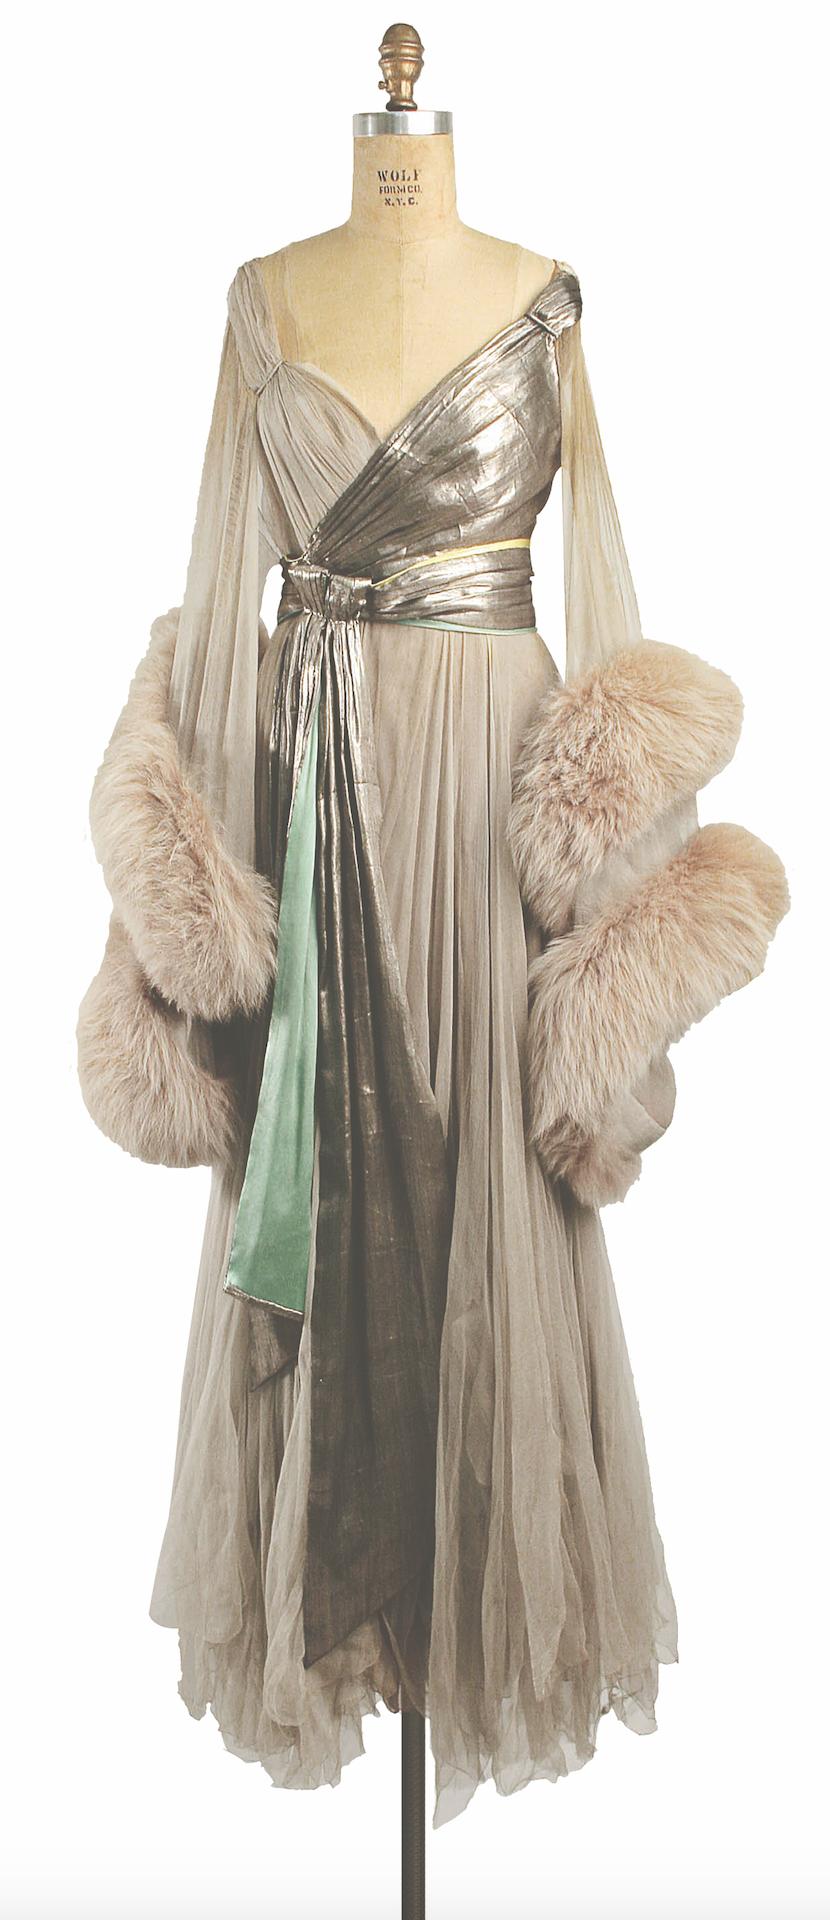 Silk, fur and metallic thread evening dress, c. 1920, by Lucile. The Metropolitan Museum of Art, New York. Gift of Irene Castle (Mrs Gerorge Enzinger), 1947 (CI47.57.1)